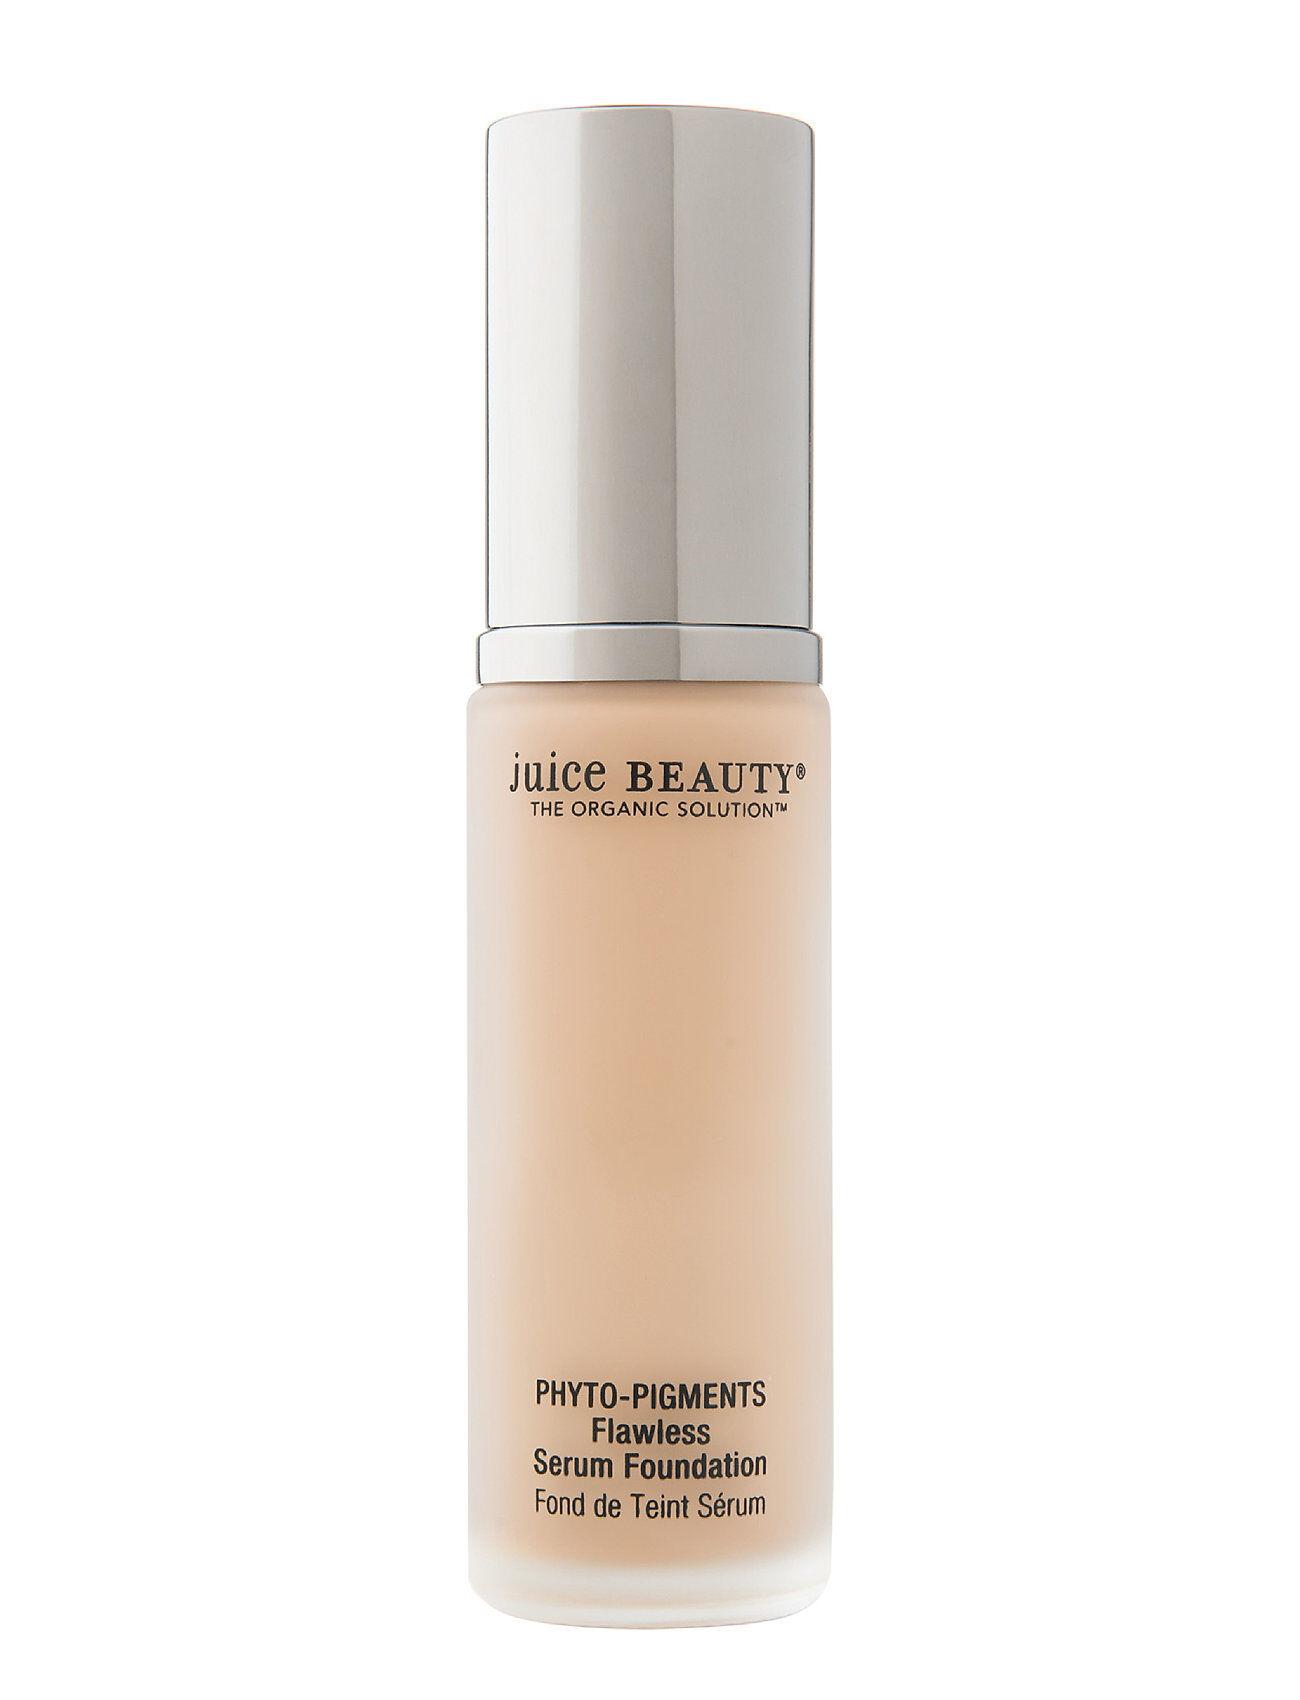 Juice Beauty Flawless Serum Foundation - 14 Sand